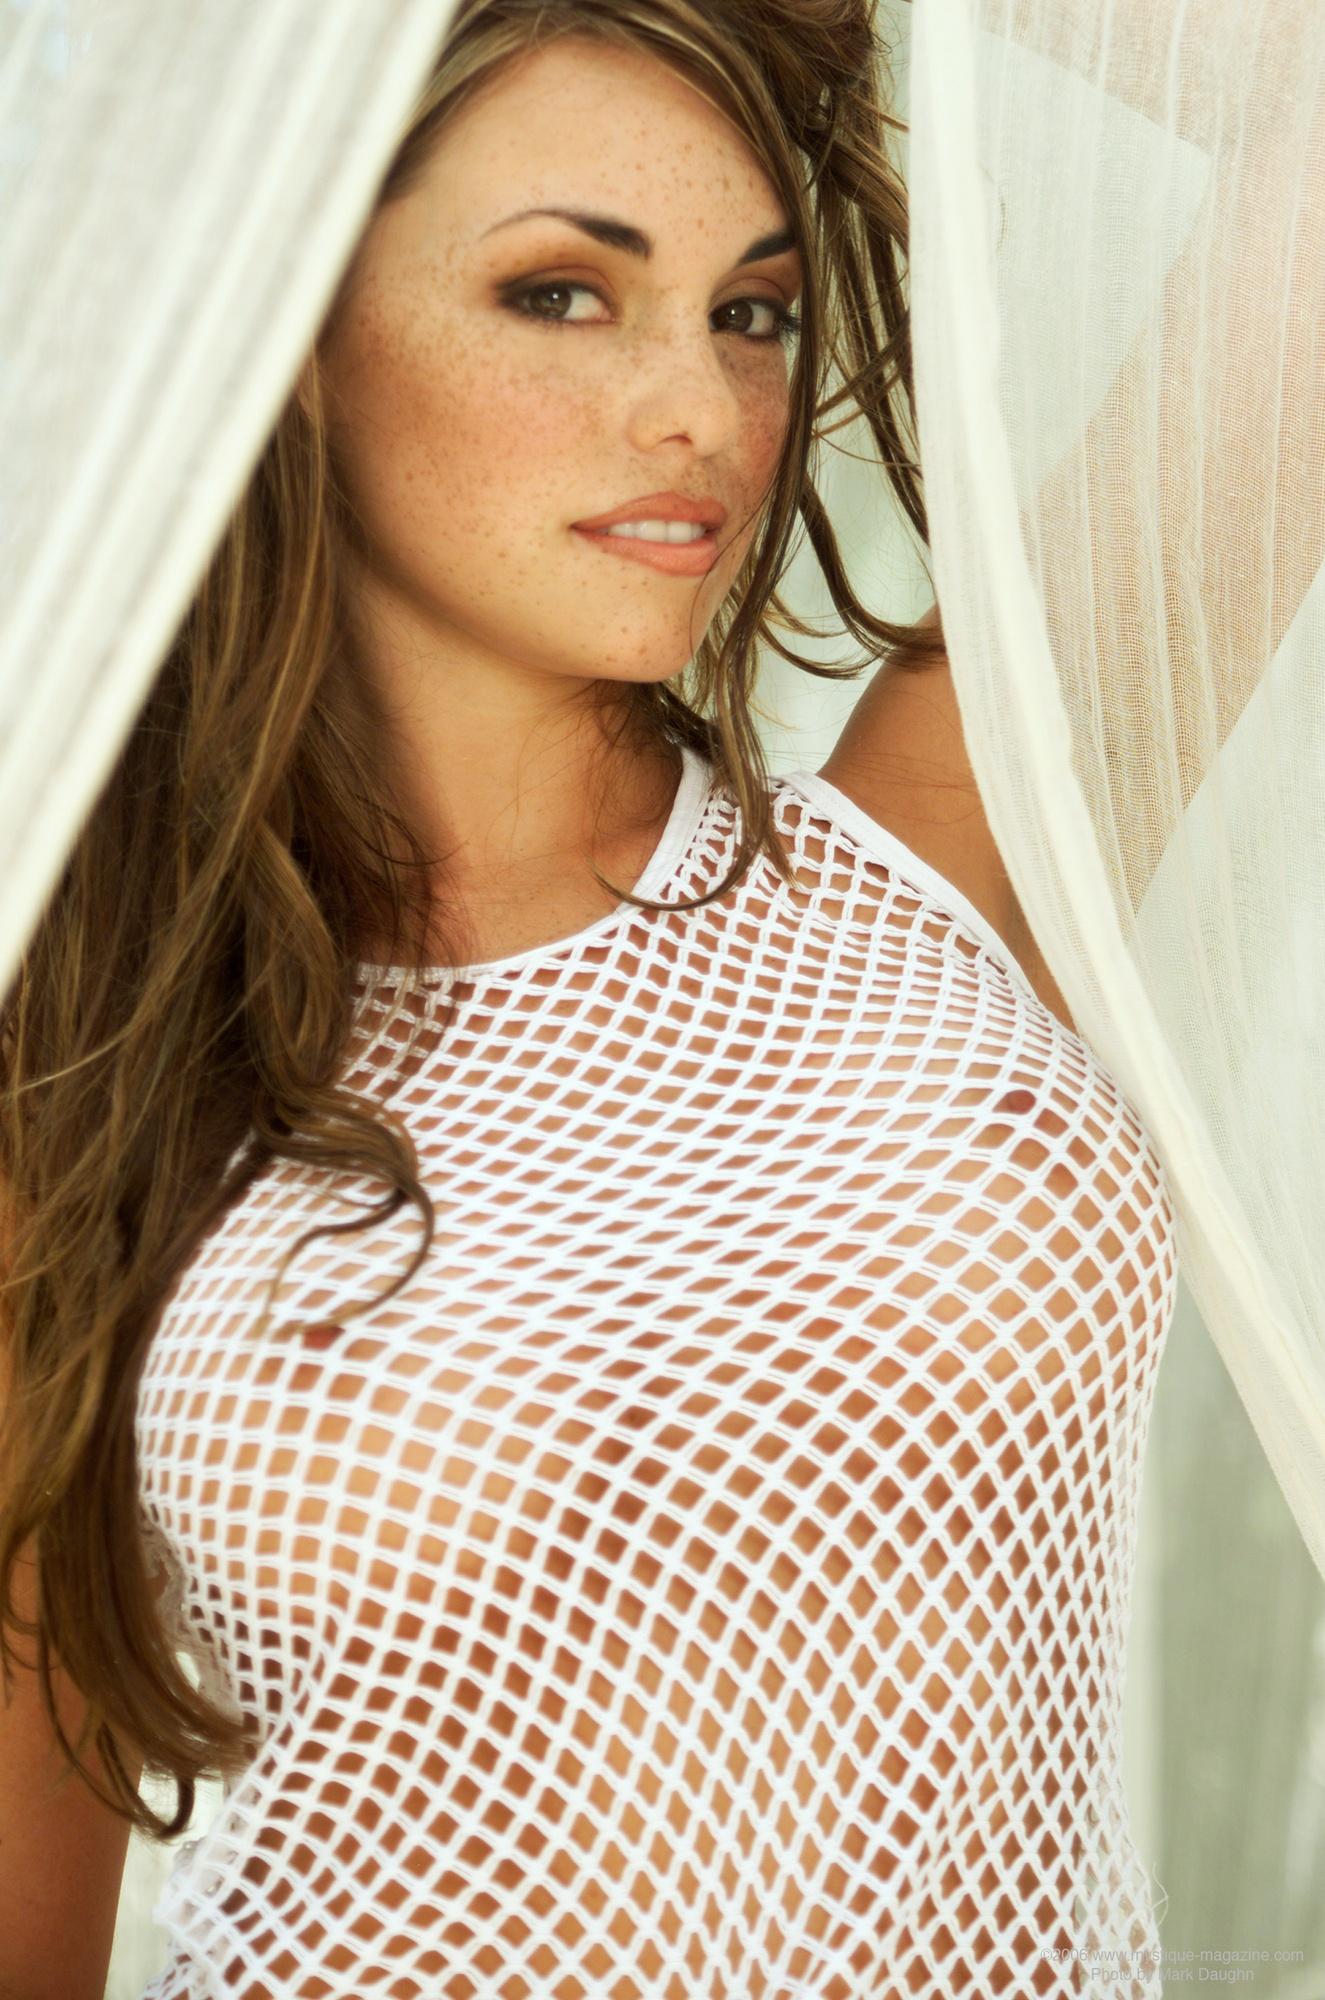 danielle-gamba-boobs-white-fishnet-nude-mystique-04